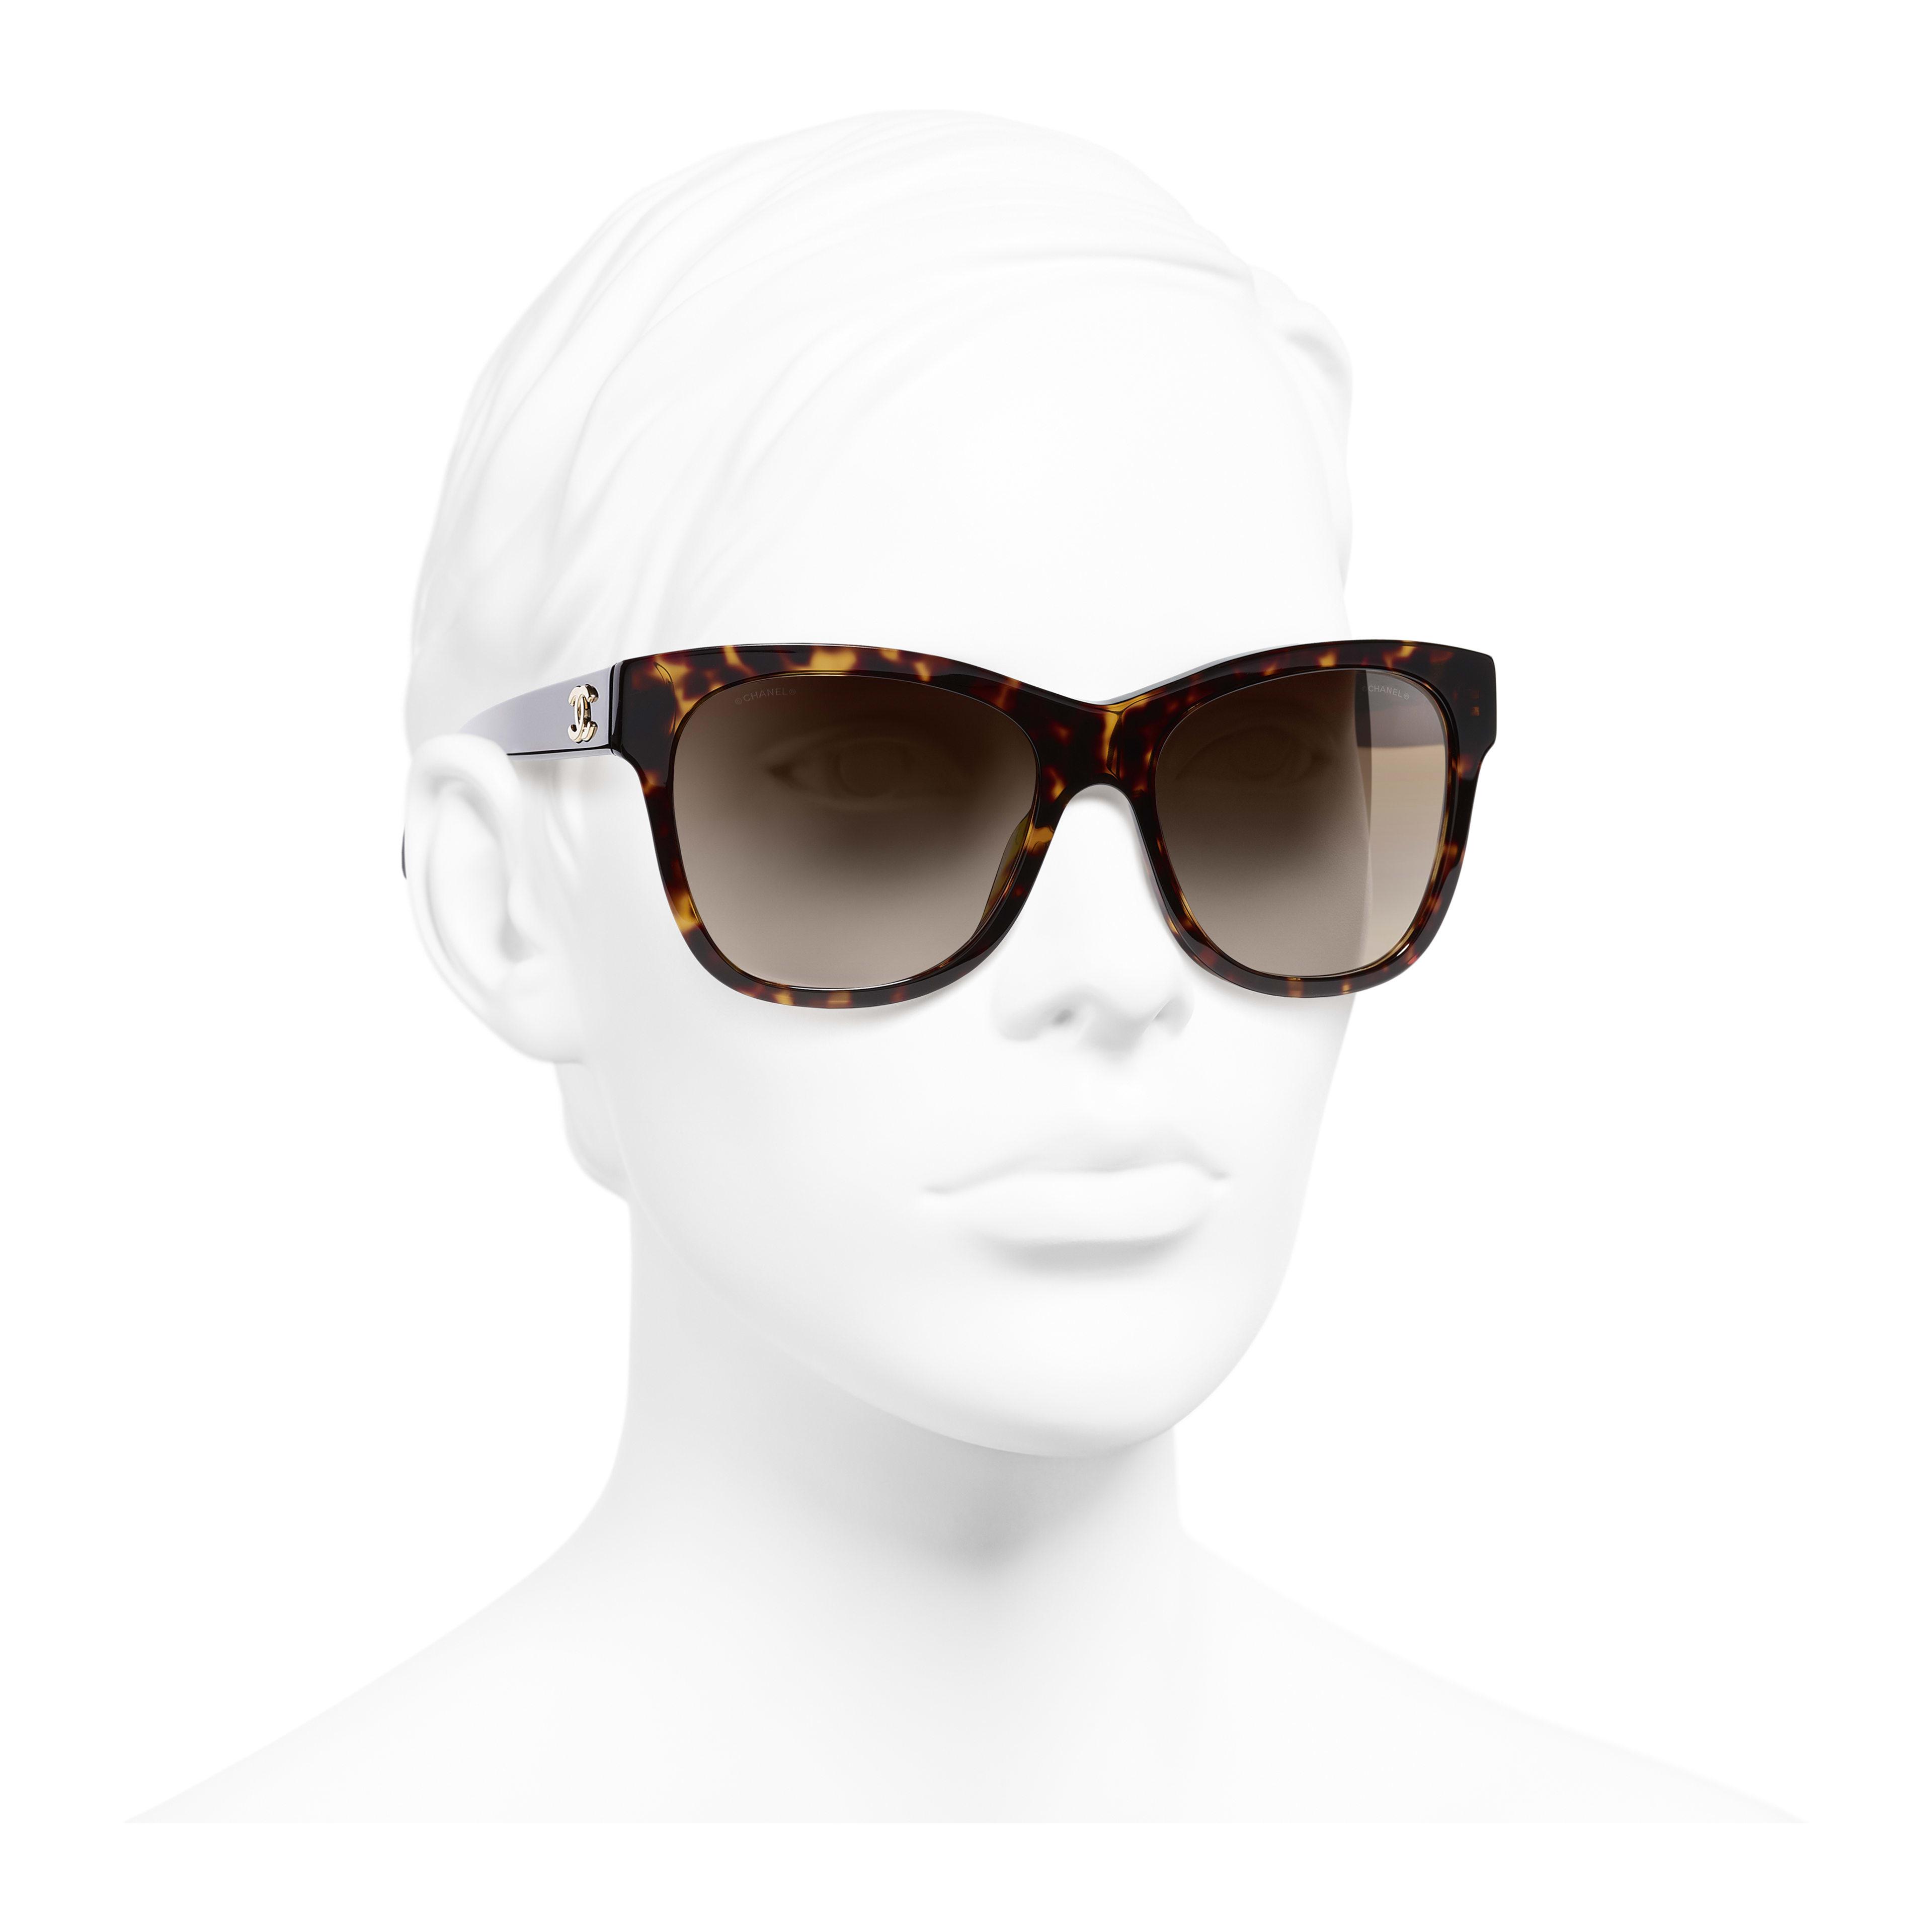 Square Sunglasses - Dark Tortoise - Acetate - Worn 3/4 view - see full sized version